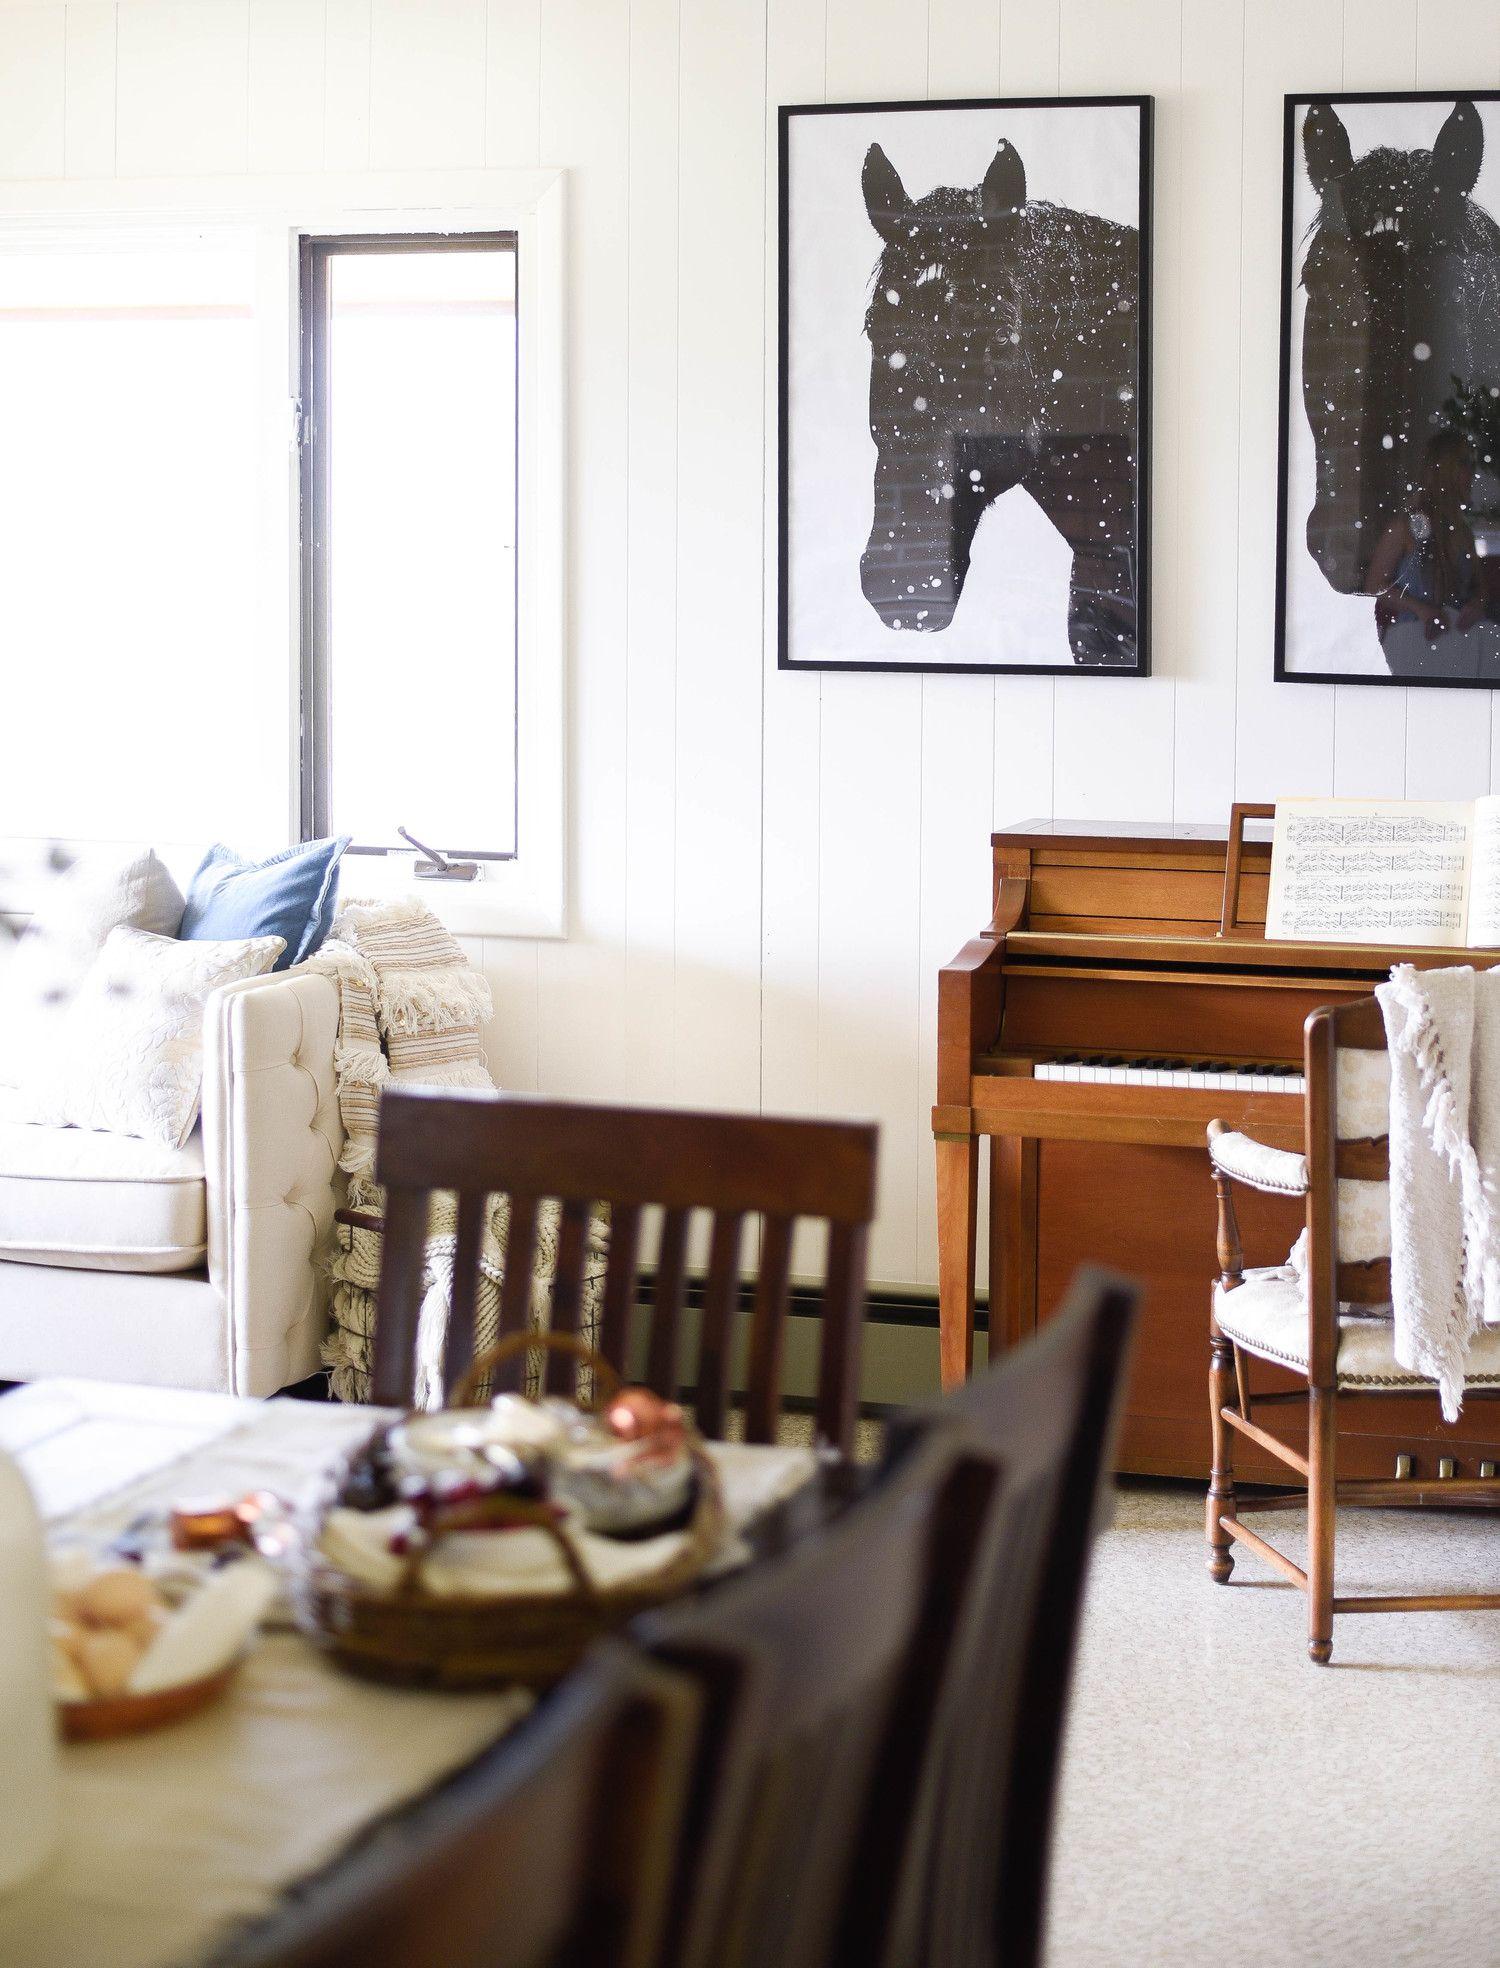 DIY large print frames from ikea | boxwoodavenue.com | rachel l ...